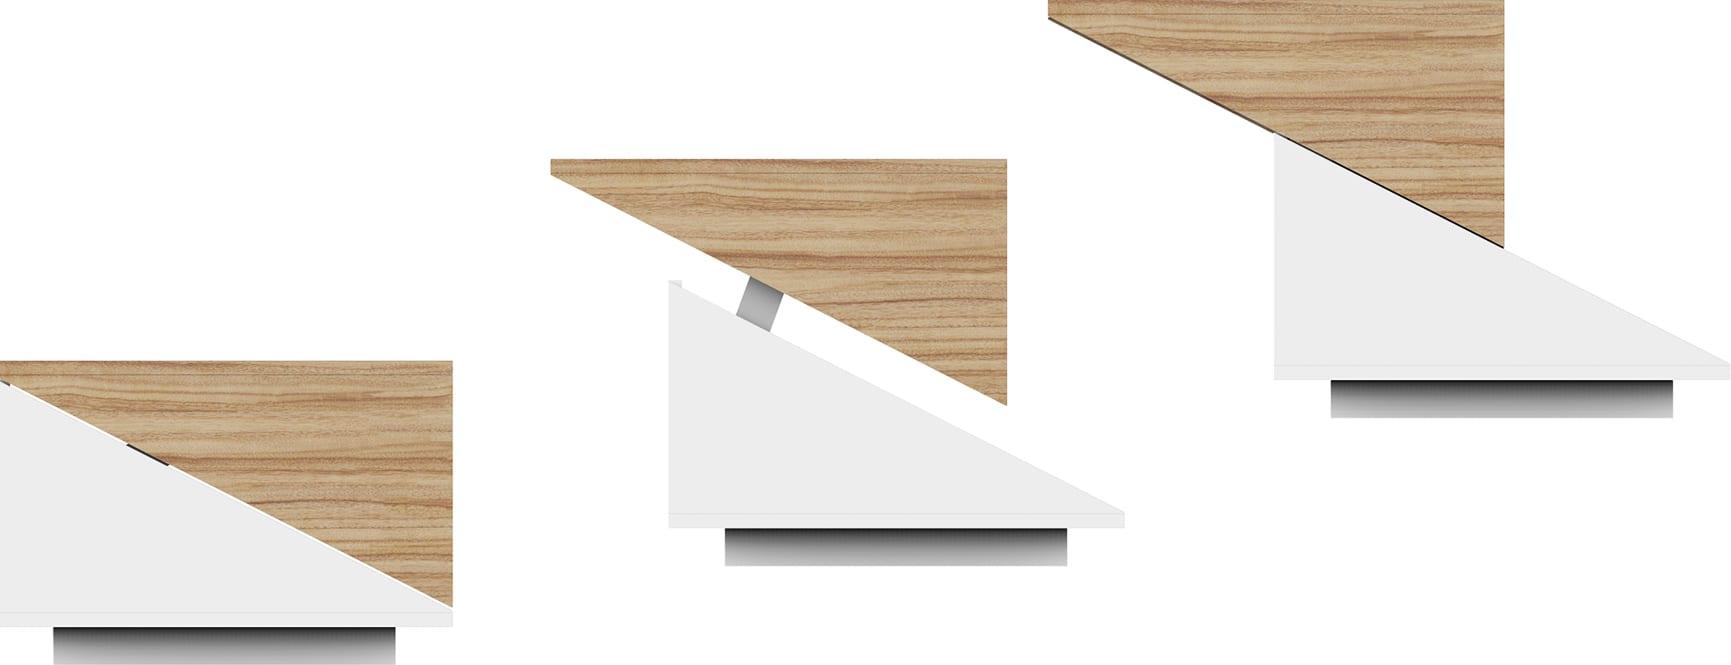 Wedge Coffee Table Portfolio Header